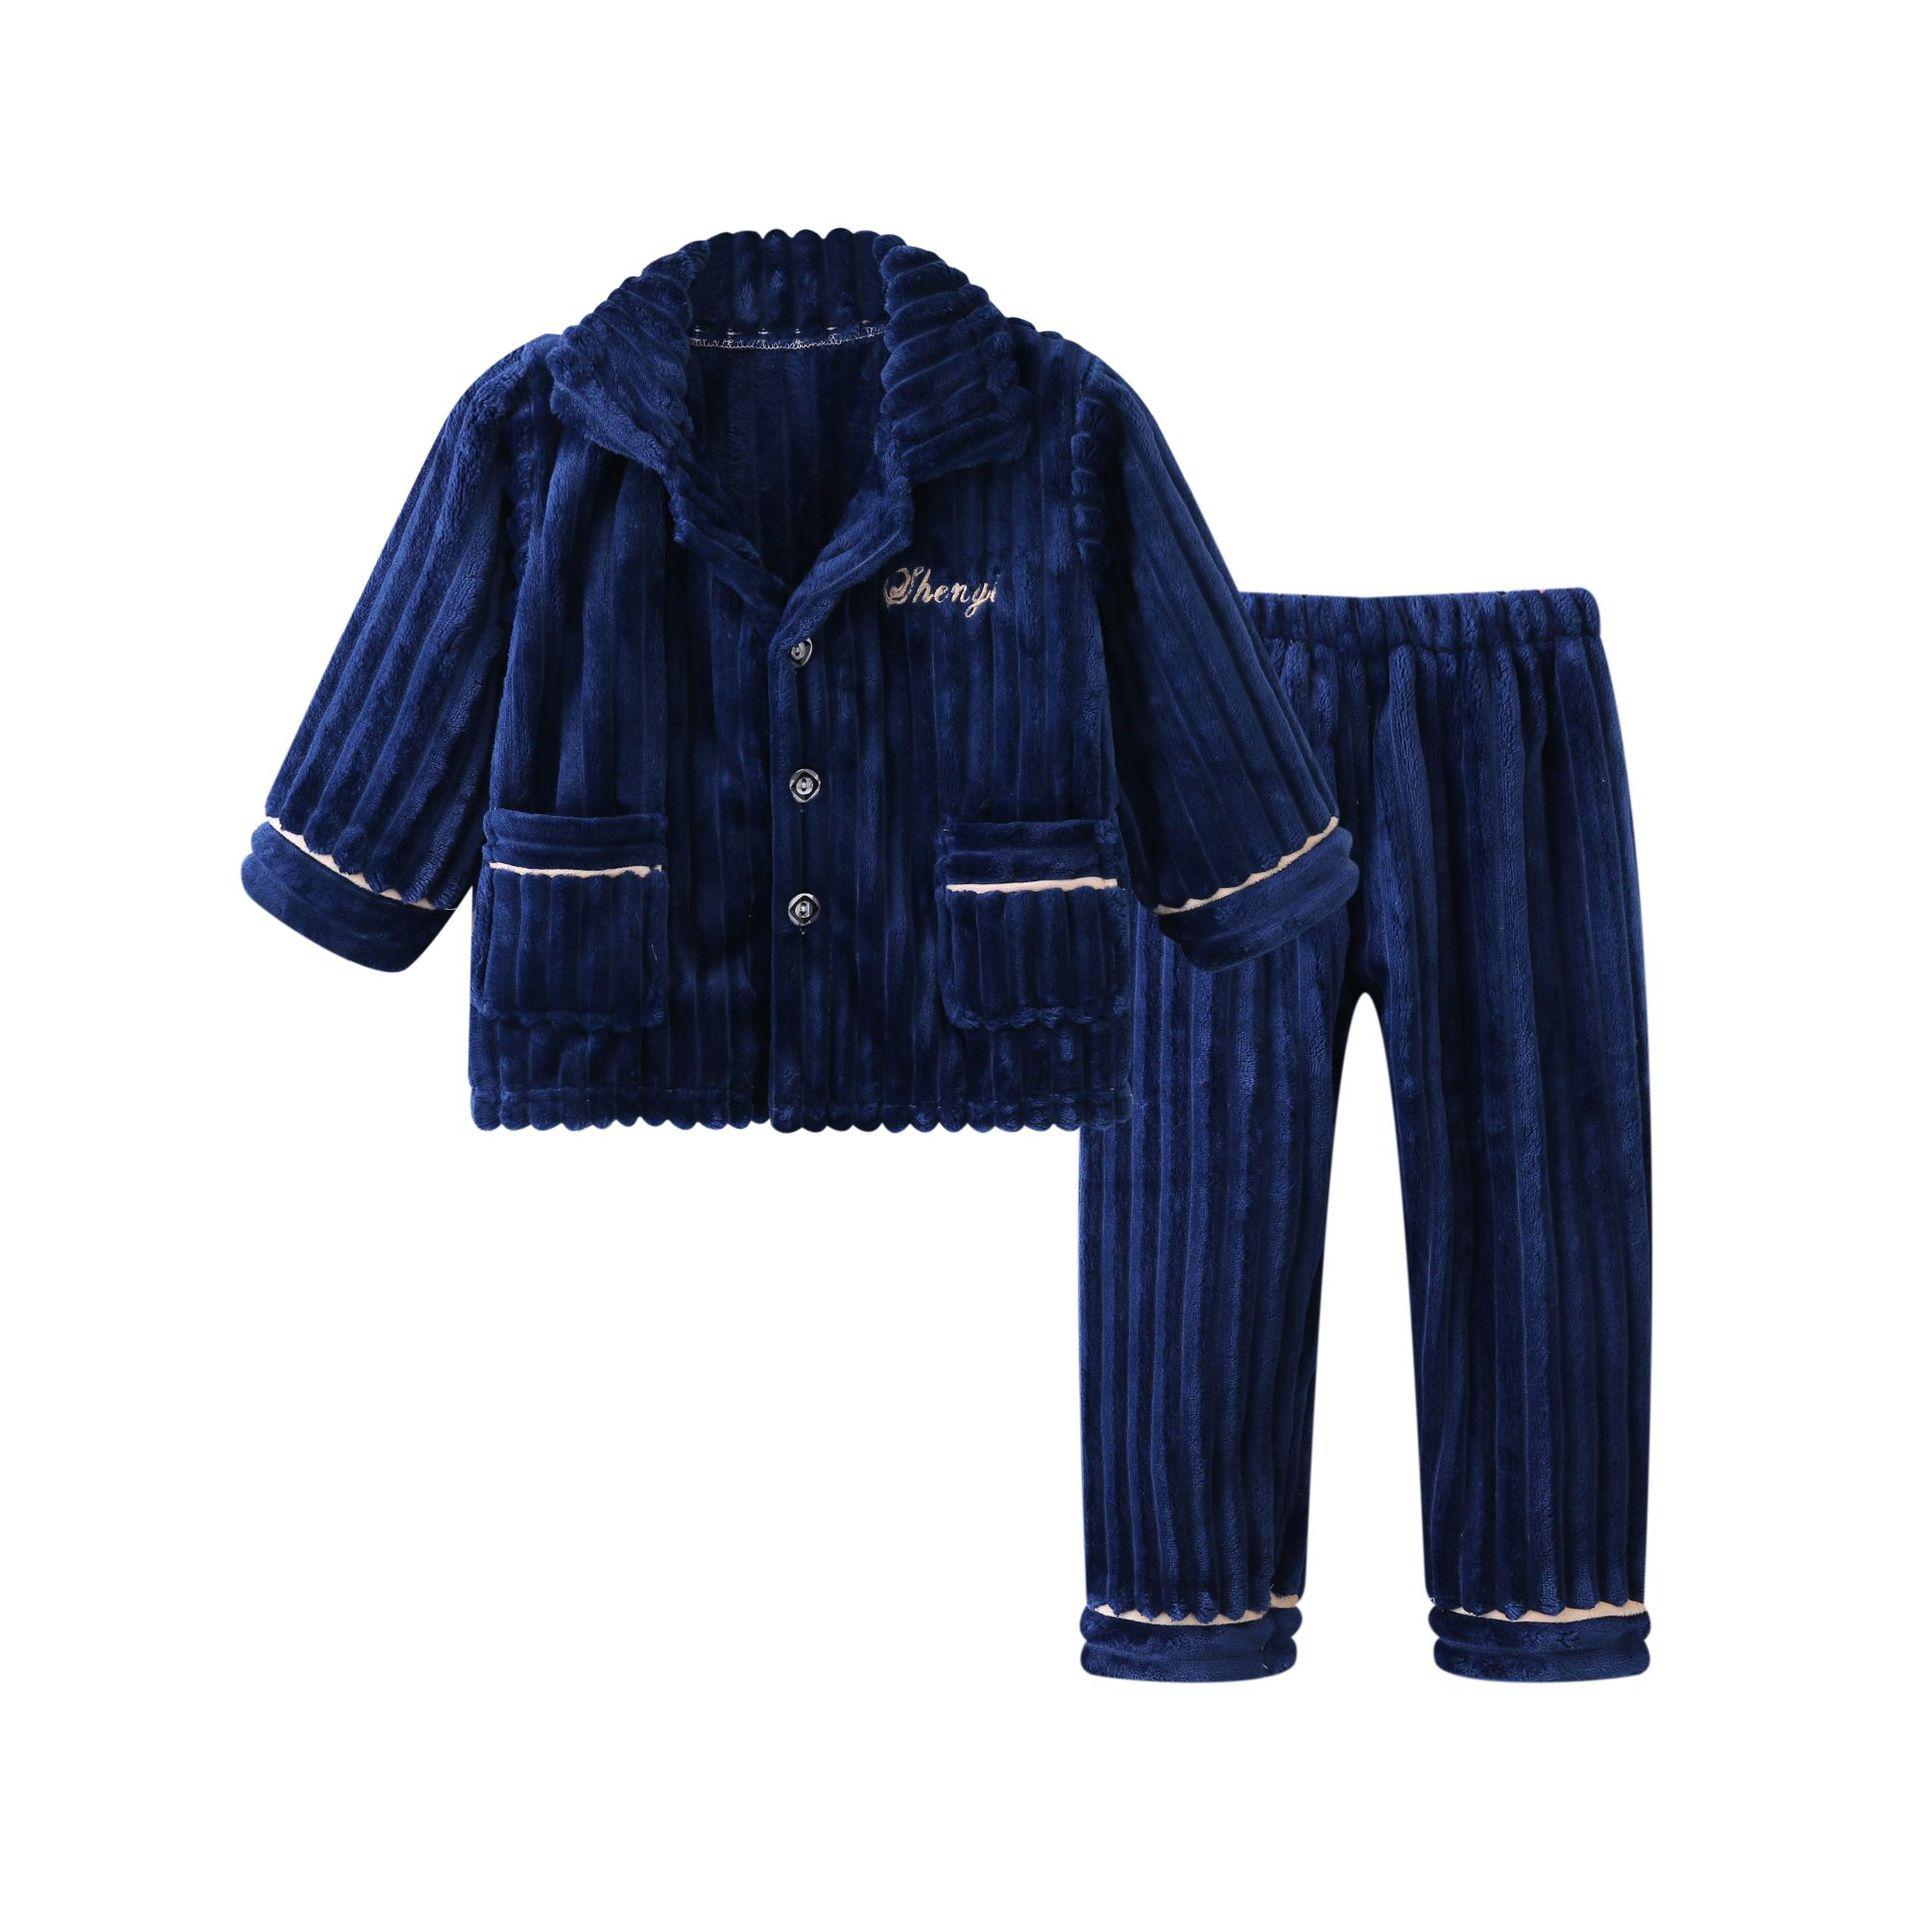 MudiPanda-طقم بيجامة عيد الميلاد للعائلة ، للأب والابن ، ملابس النوم للأب والابن ، 2021